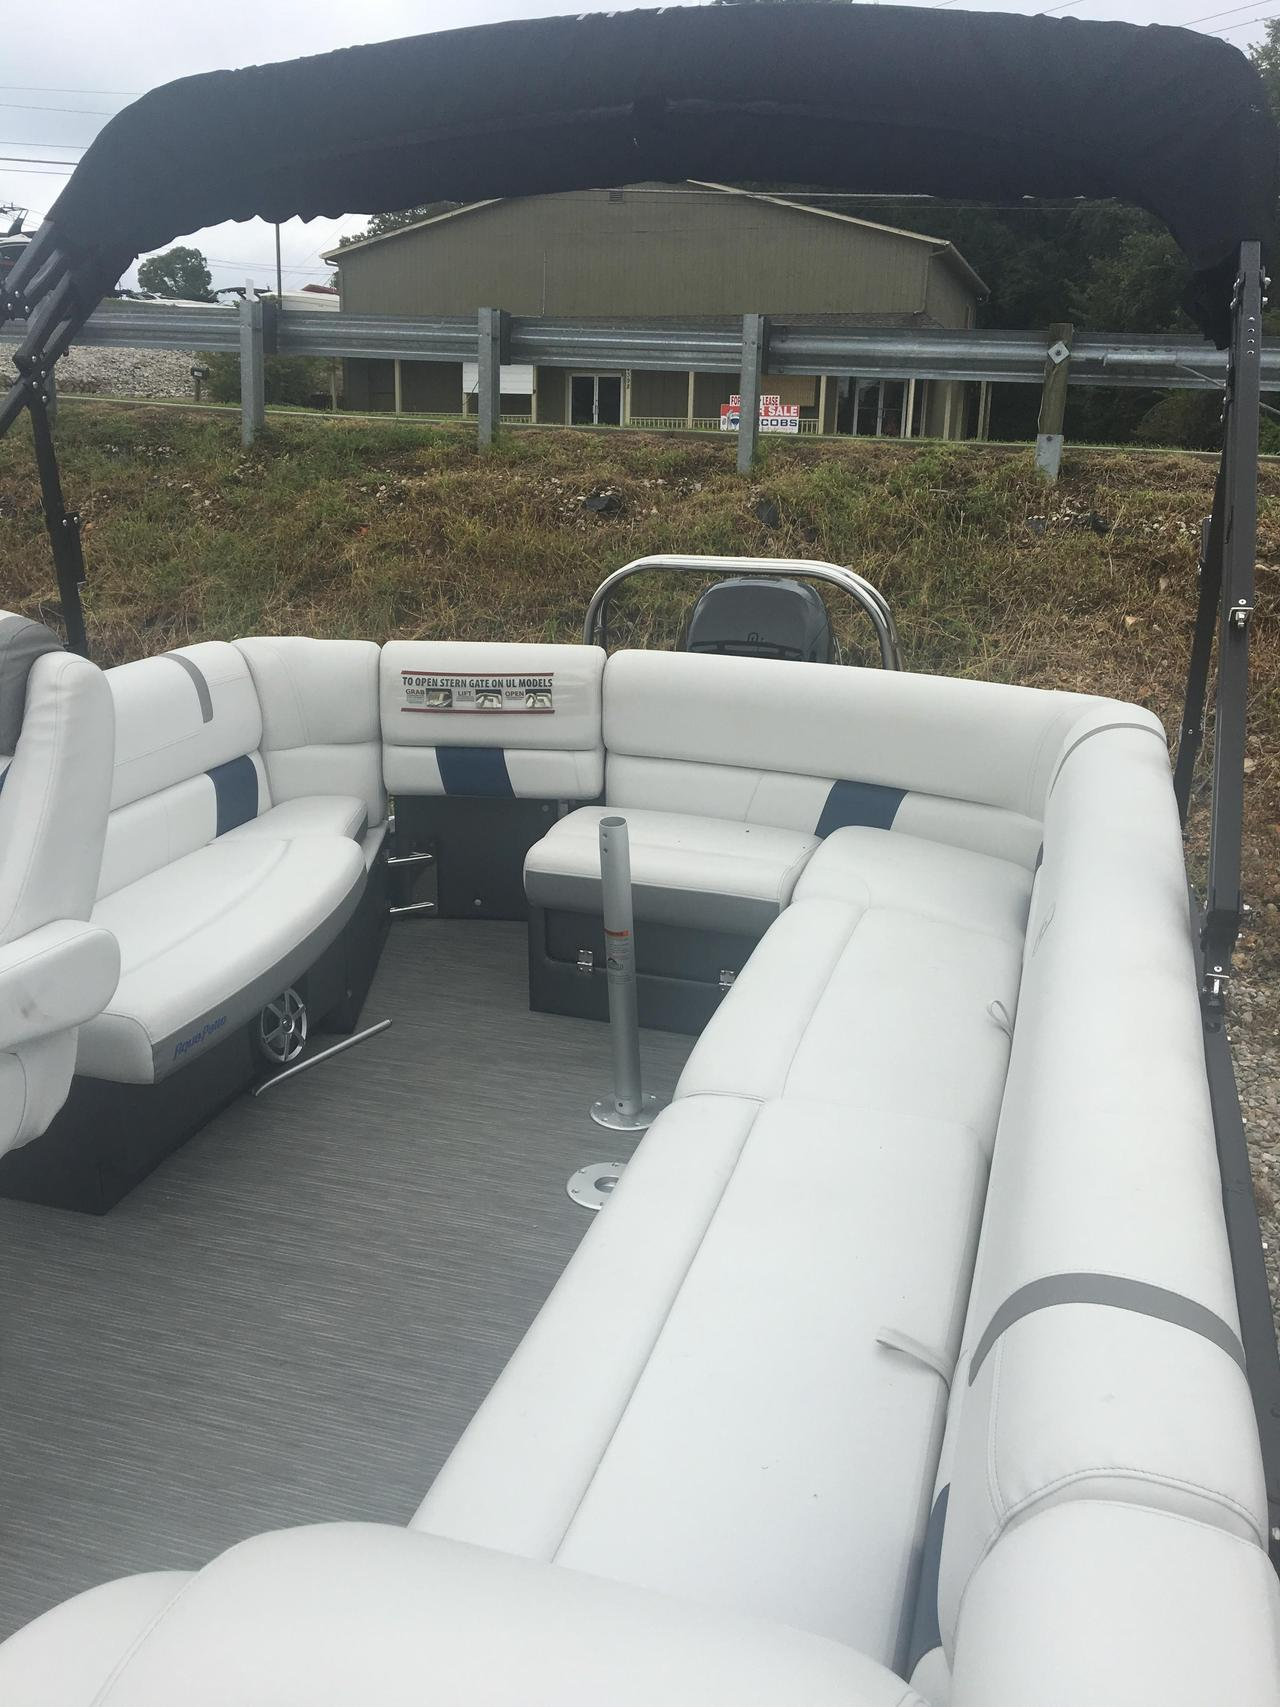 2017 New Aqua Patio 255 UL Pontoon Boat For Sale Osage Beach MO